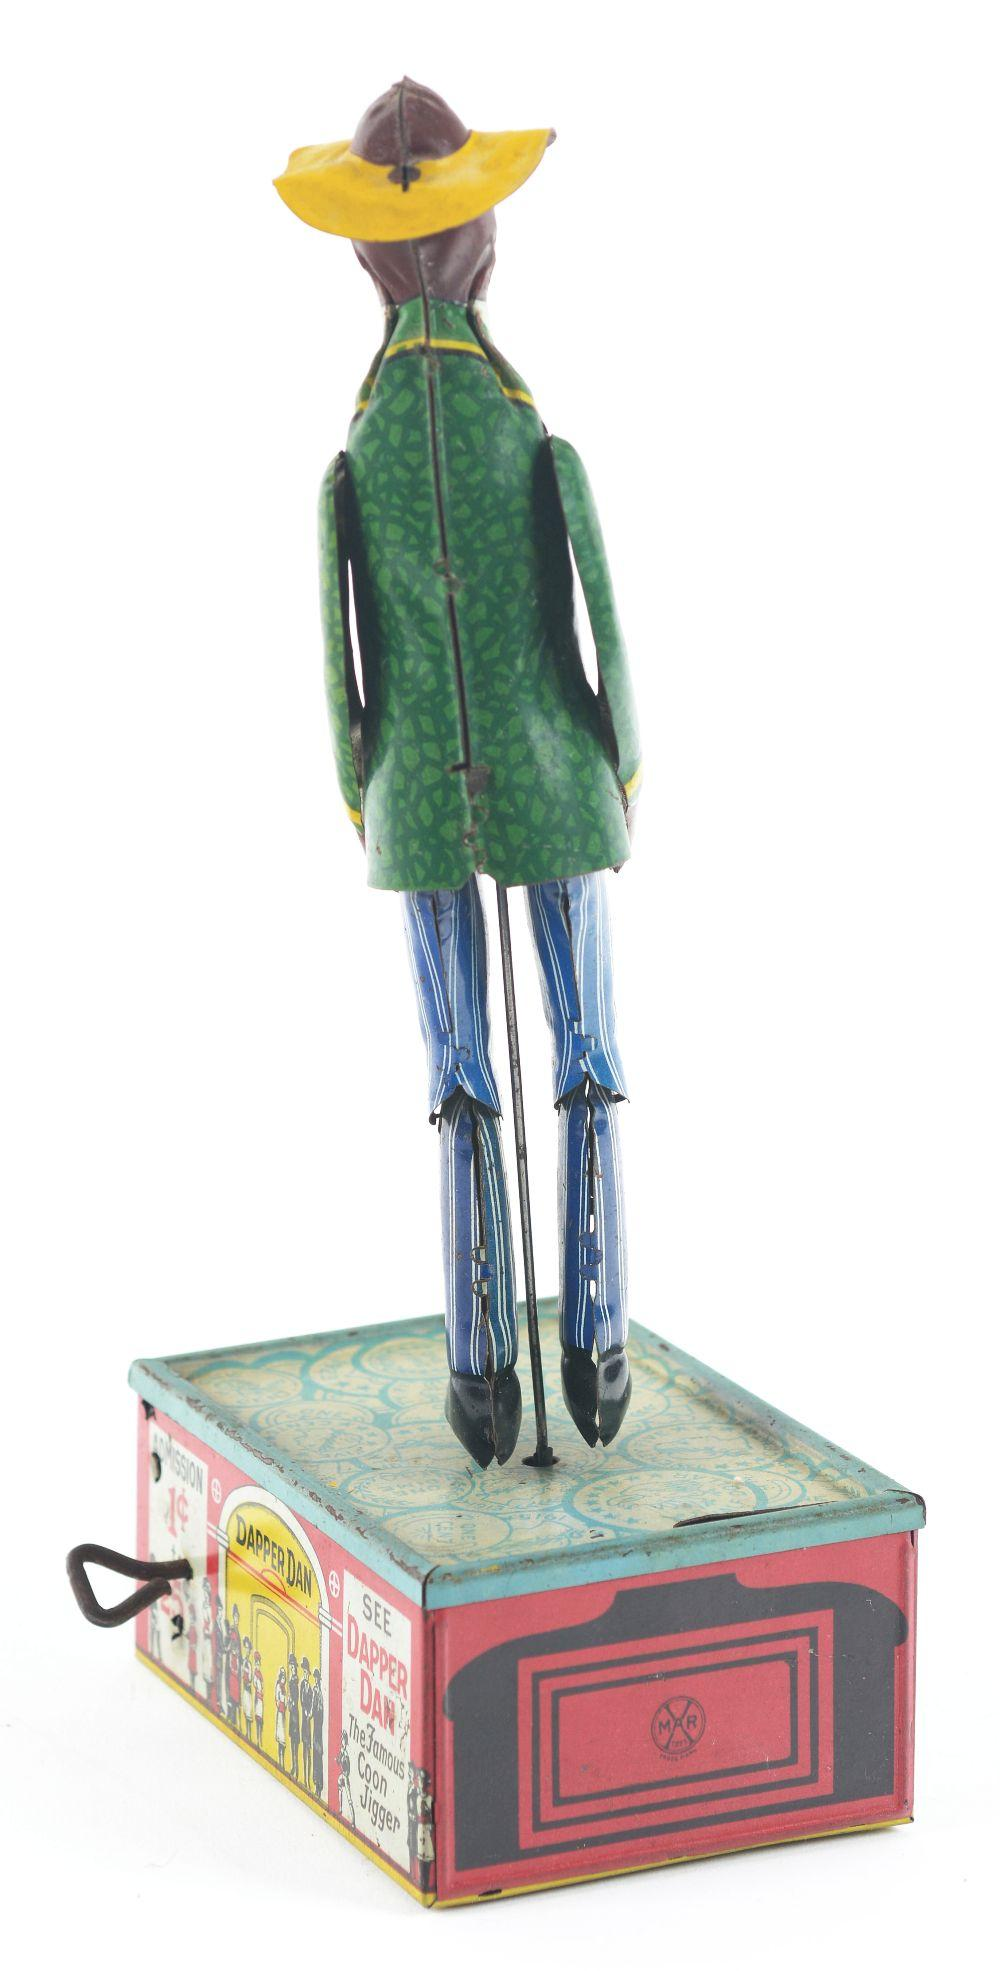 Lot 2329: Scarce Marx Tin-Litho Wind-Up Dapper Dan Dancing Coin Bank Toy.